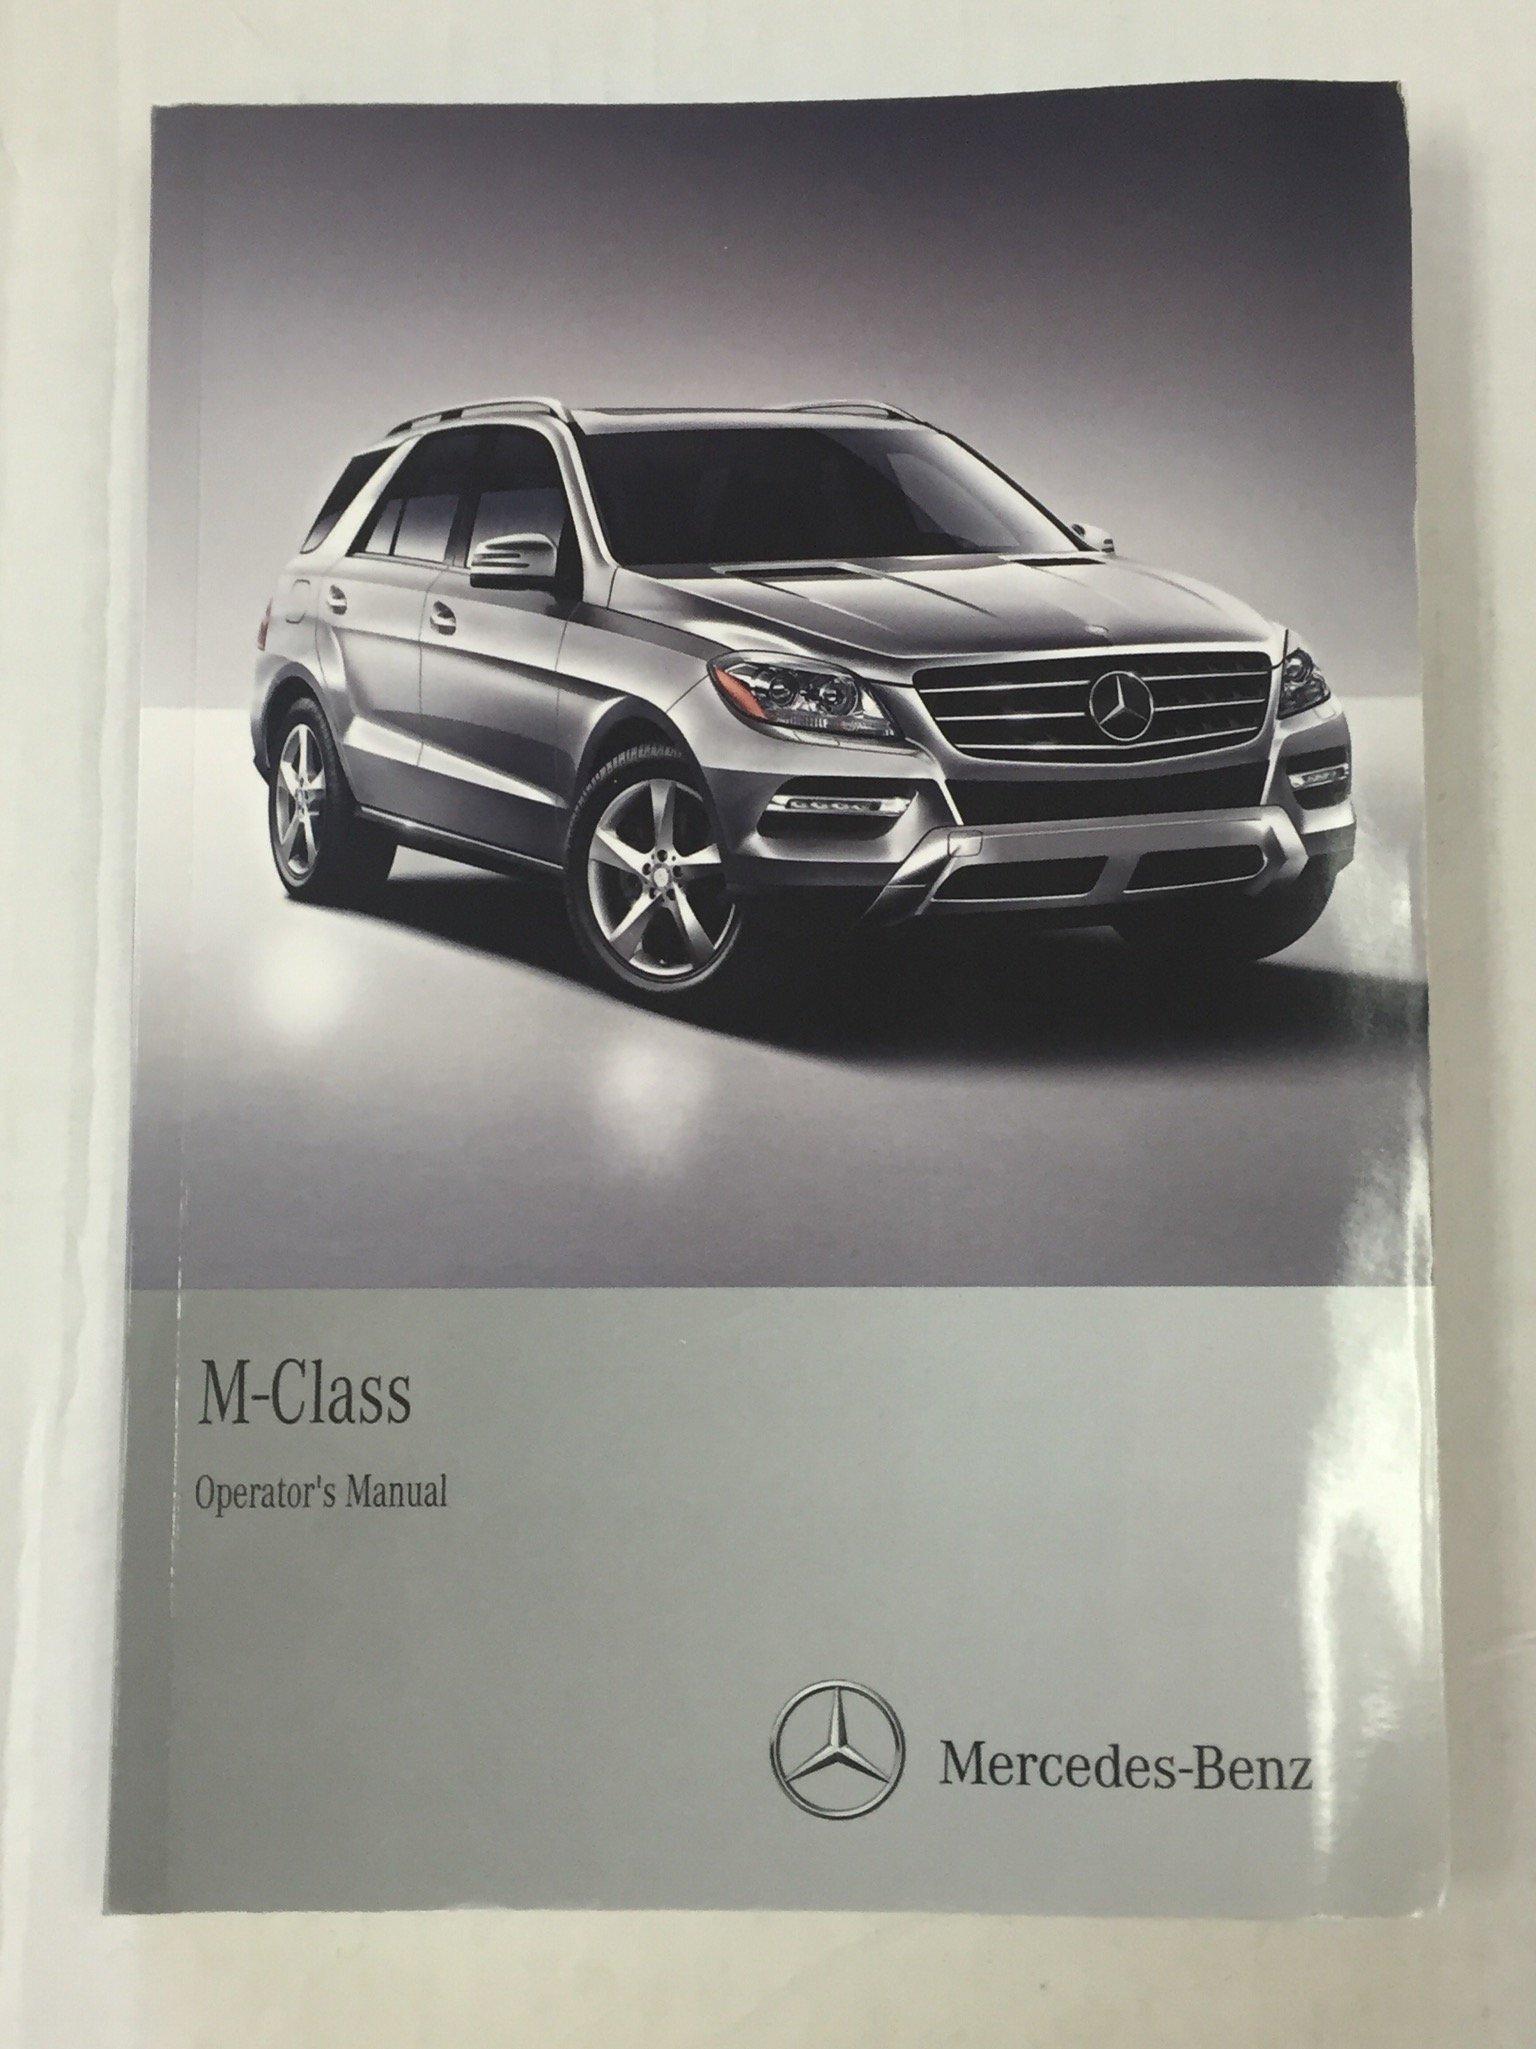 2012 mercedes m class owner s manual set w comand mercedes benz rh amazon com datamax m class manual datamax m class 4210 manual